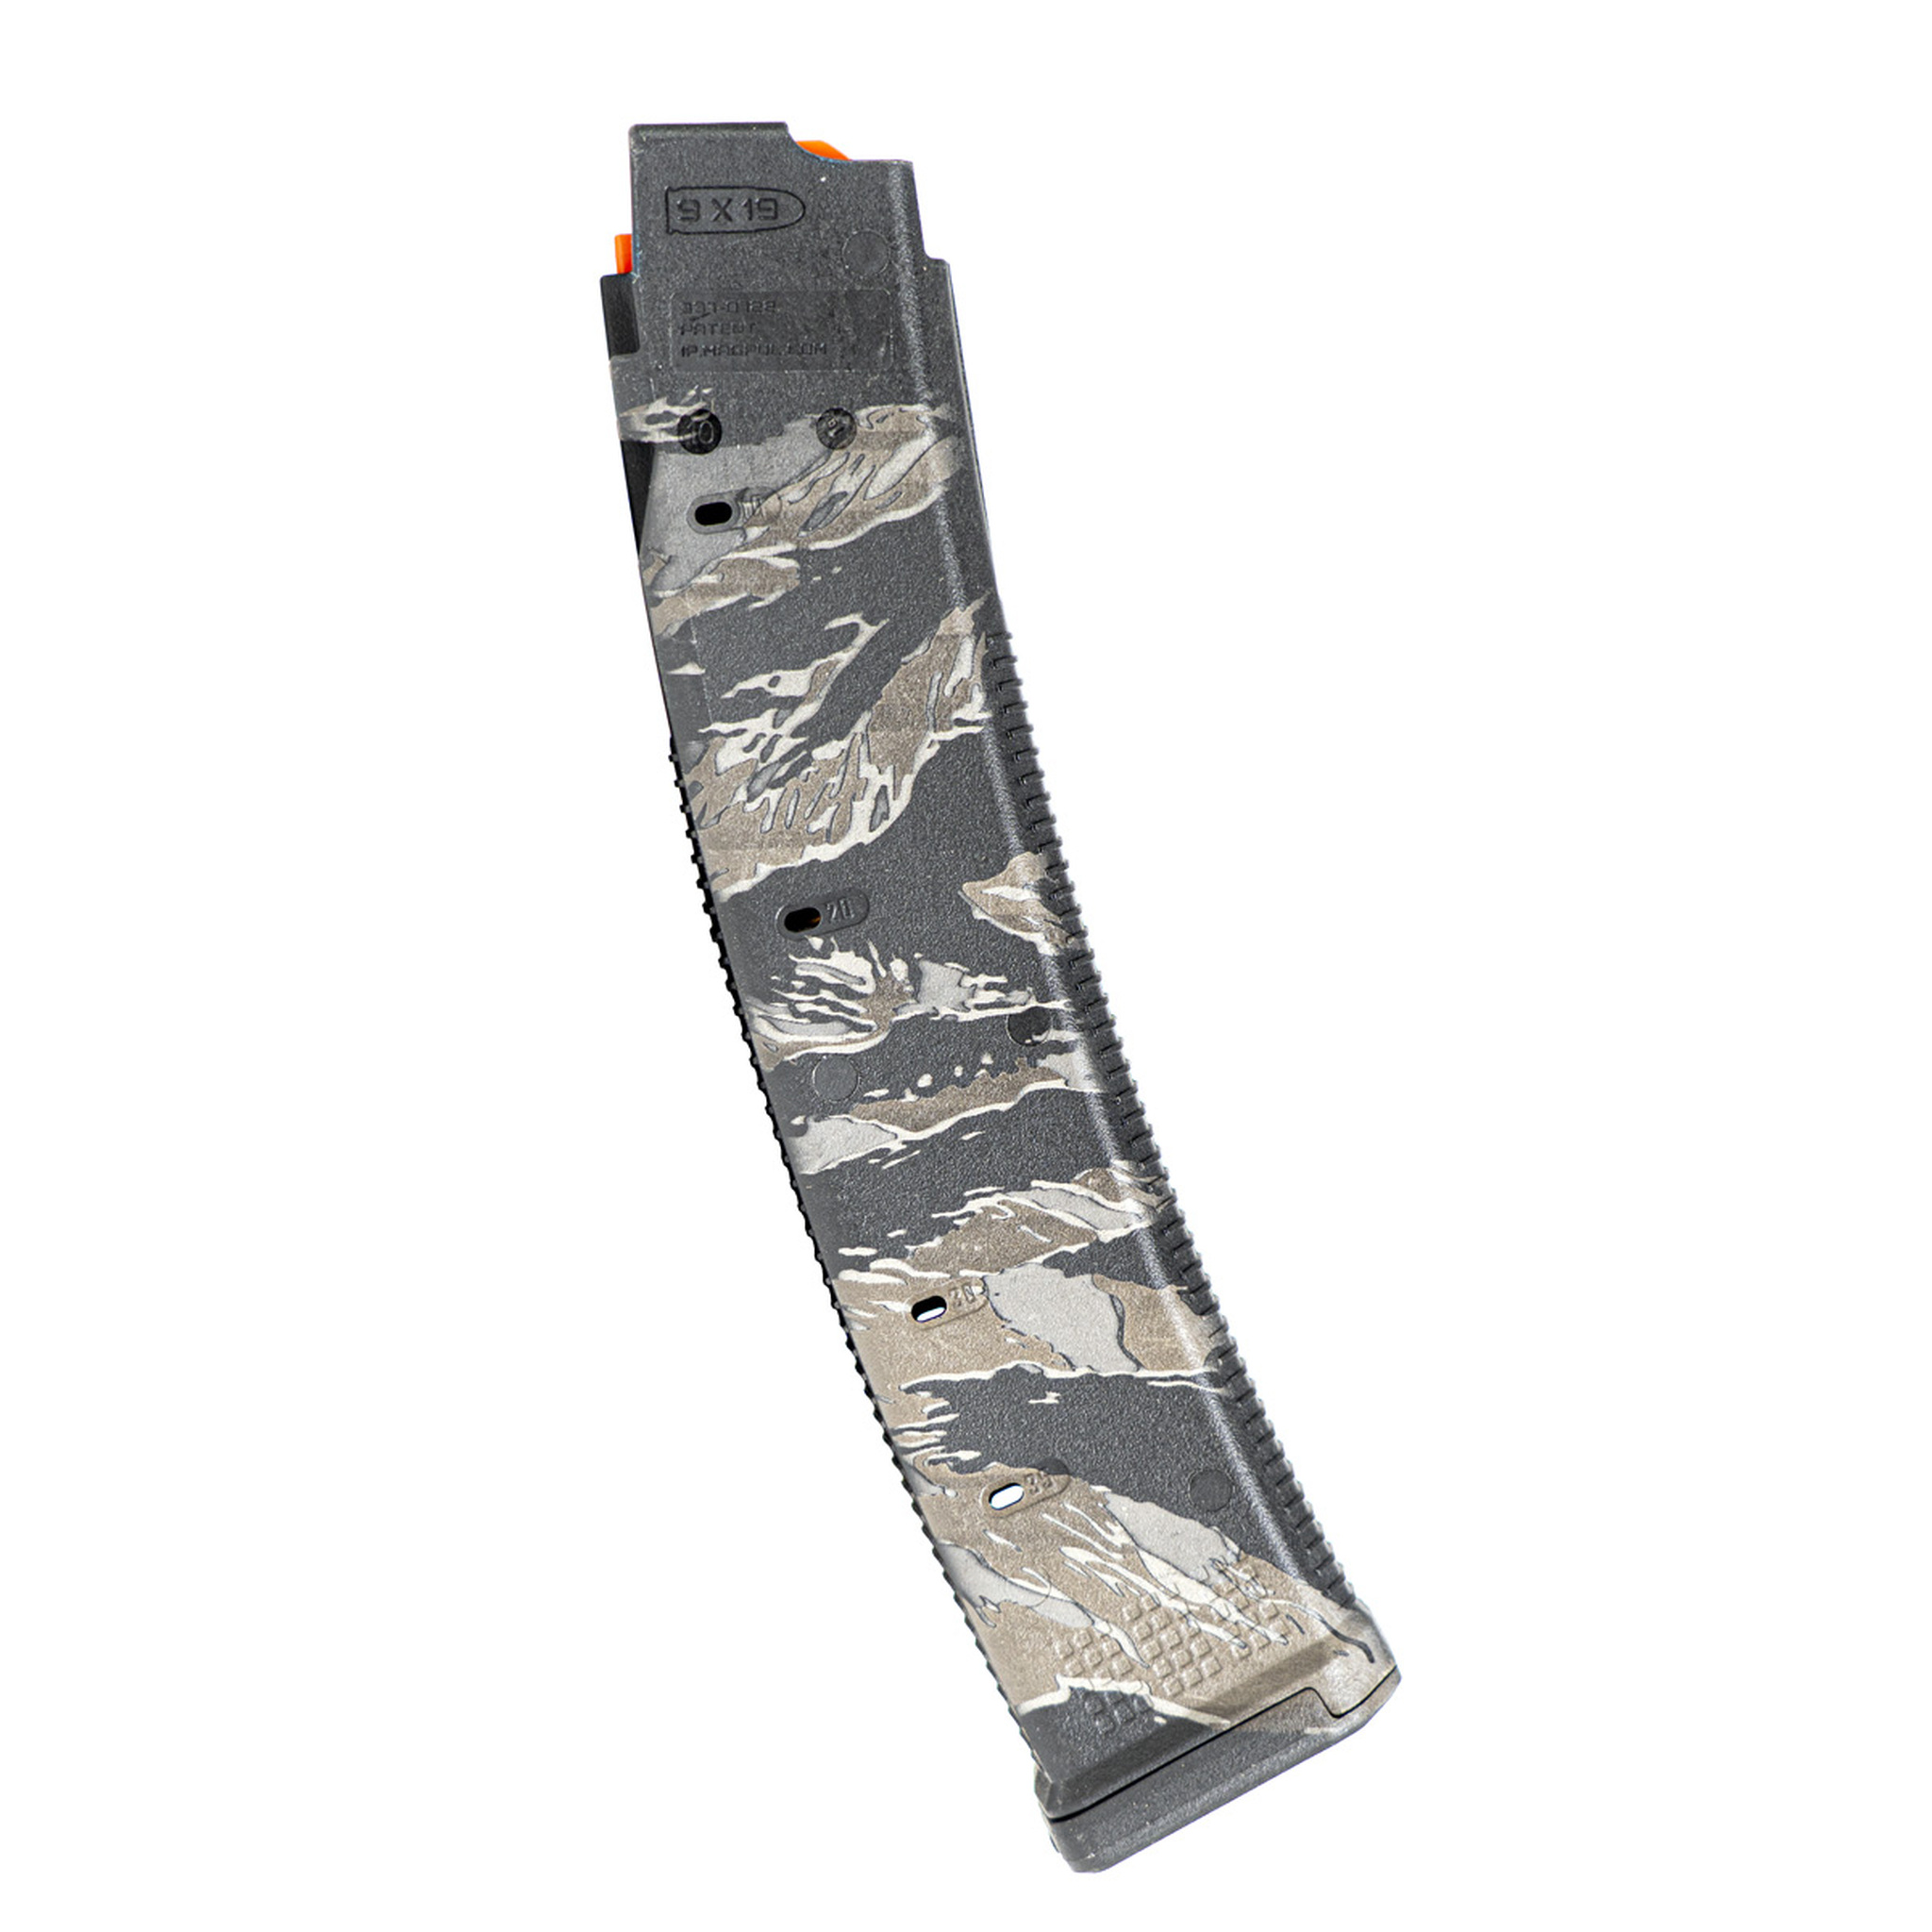 rifle dynamics maglads custom magazines cz scorpion ak47 woodlands mag ss-leto russian